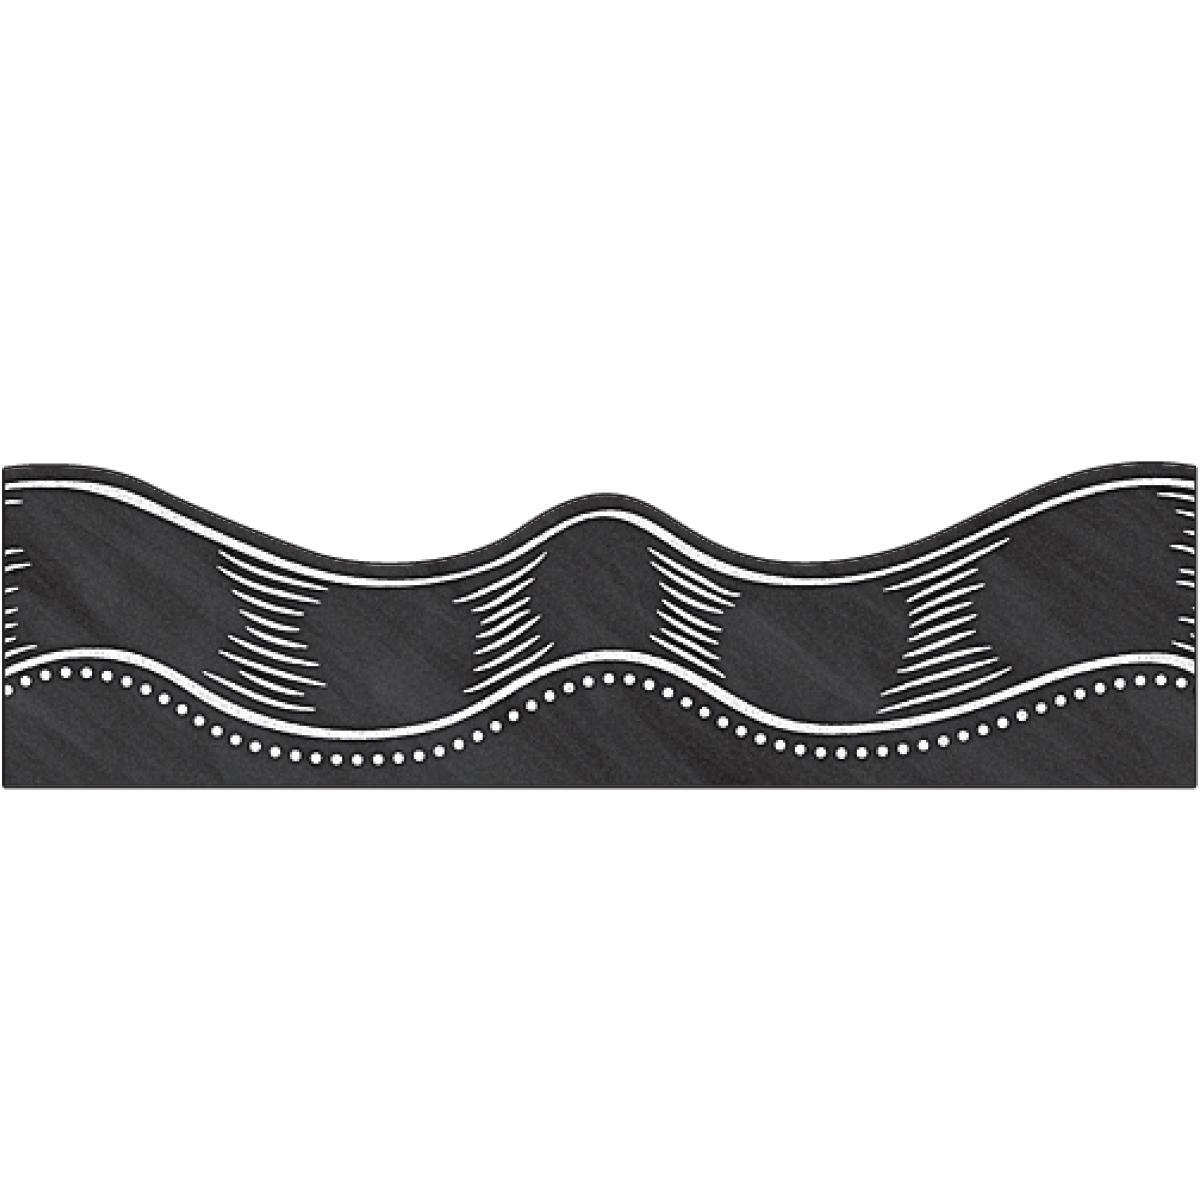 Chalkboard Ribbon Trimmer